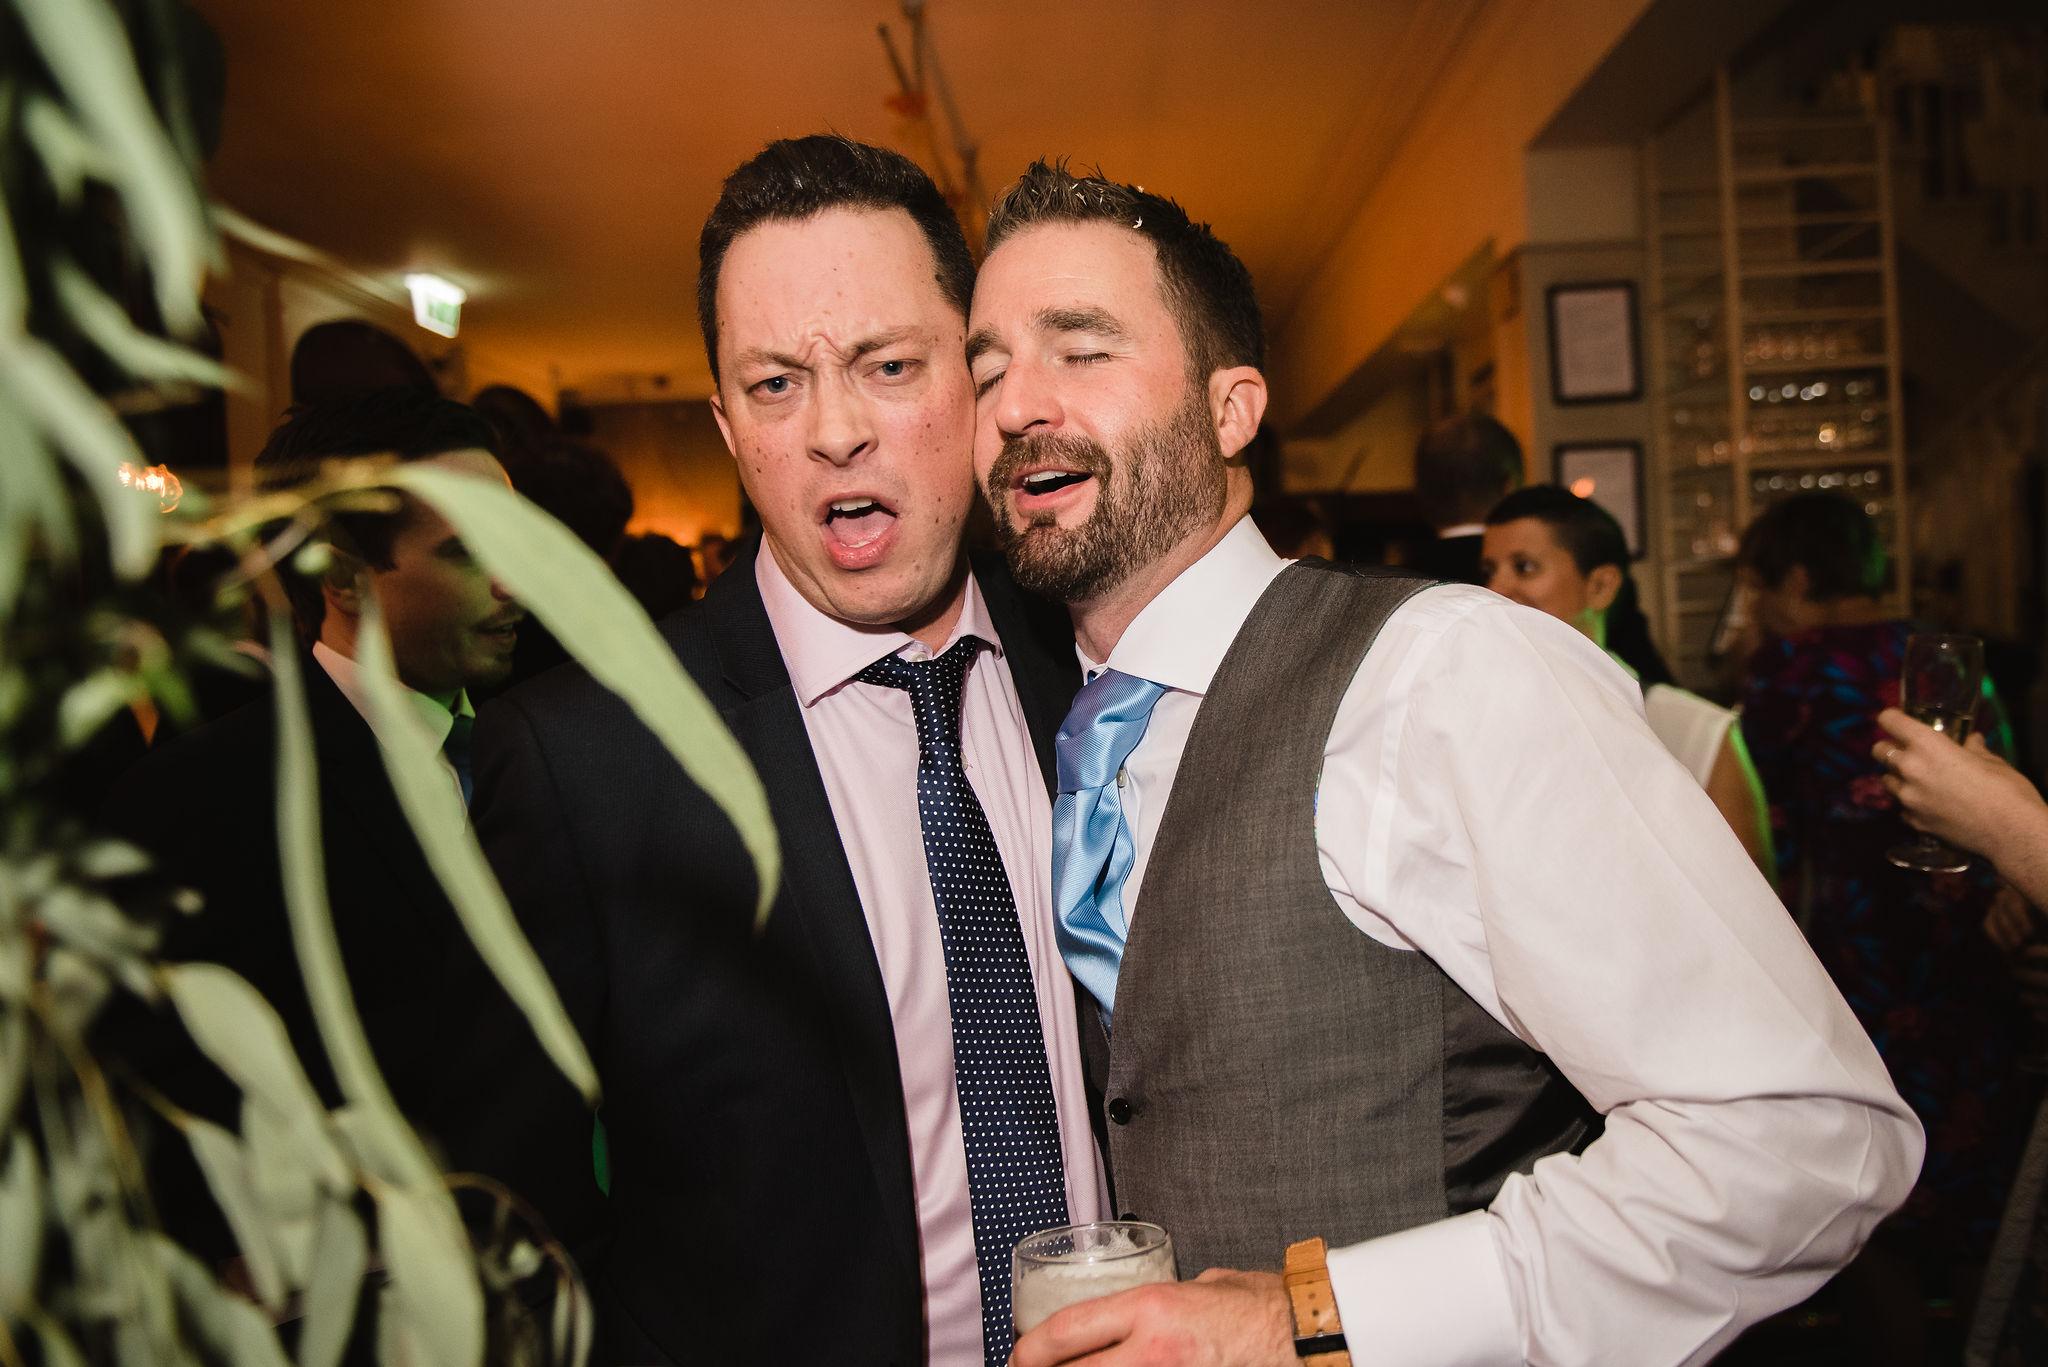 Islington_Town_Hall_Wedding_Prince_Albert_Pub_Camden_90.jpg